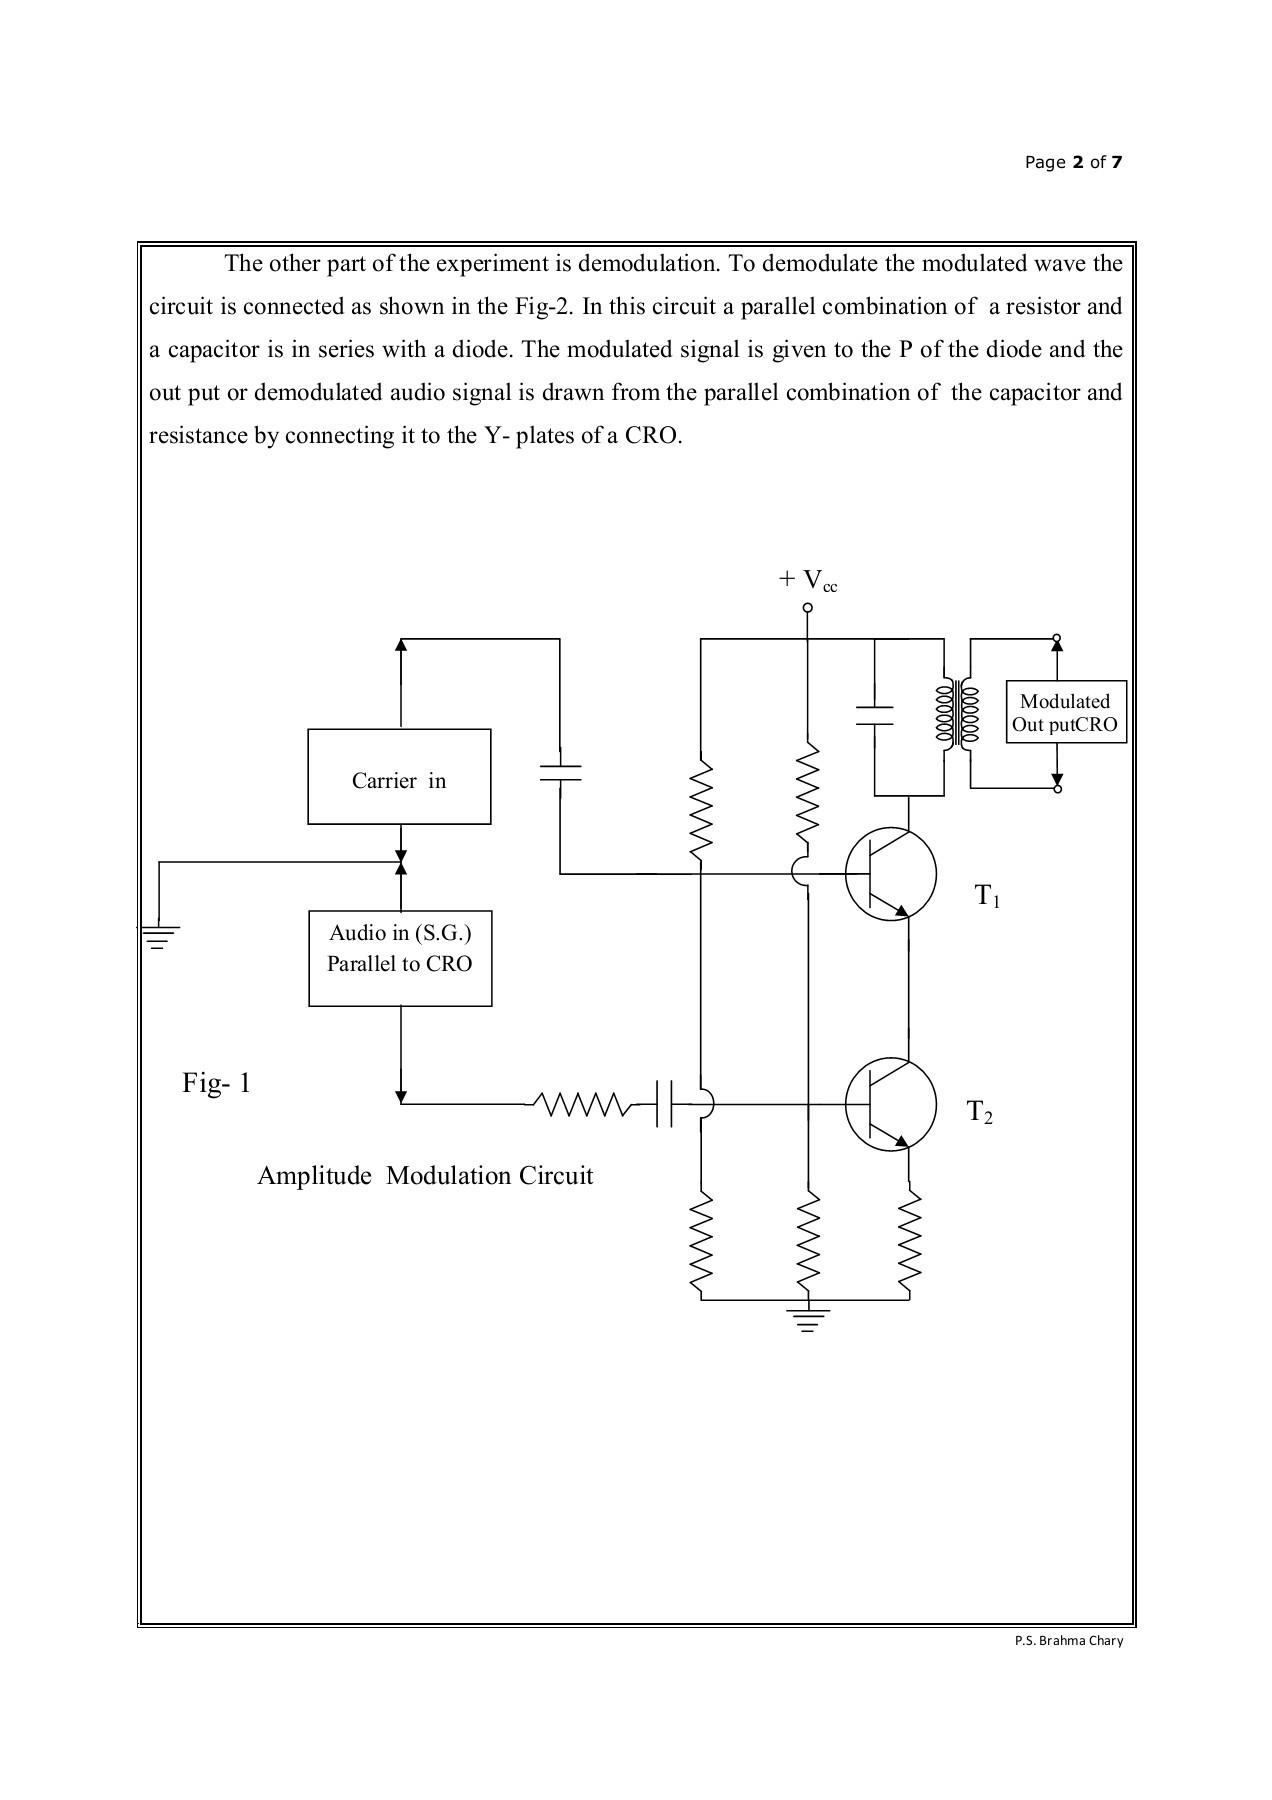 hight resolution of amplitude modulation and detection psbrahmachary s blog fliphtml5